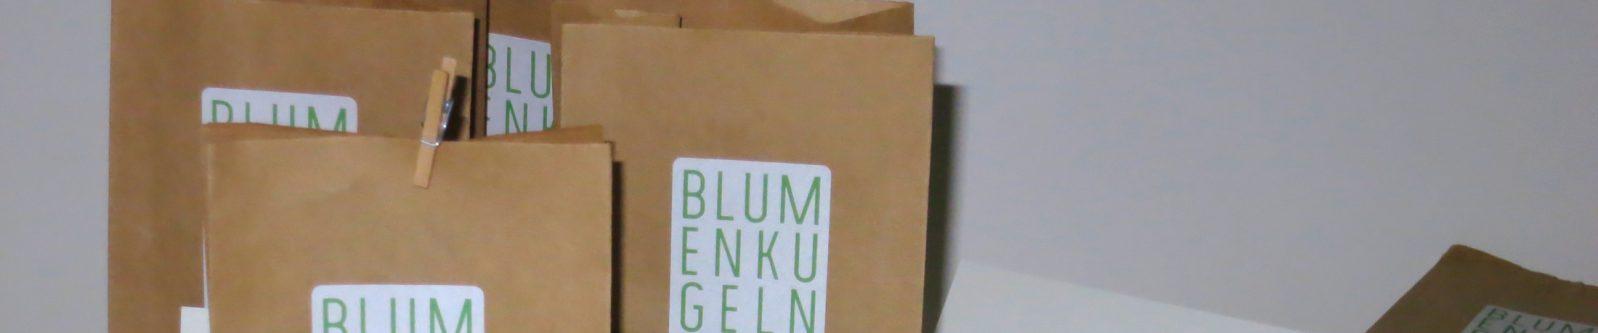 Verpackung für Blumenkugeln @ zappo.berlin, 2016